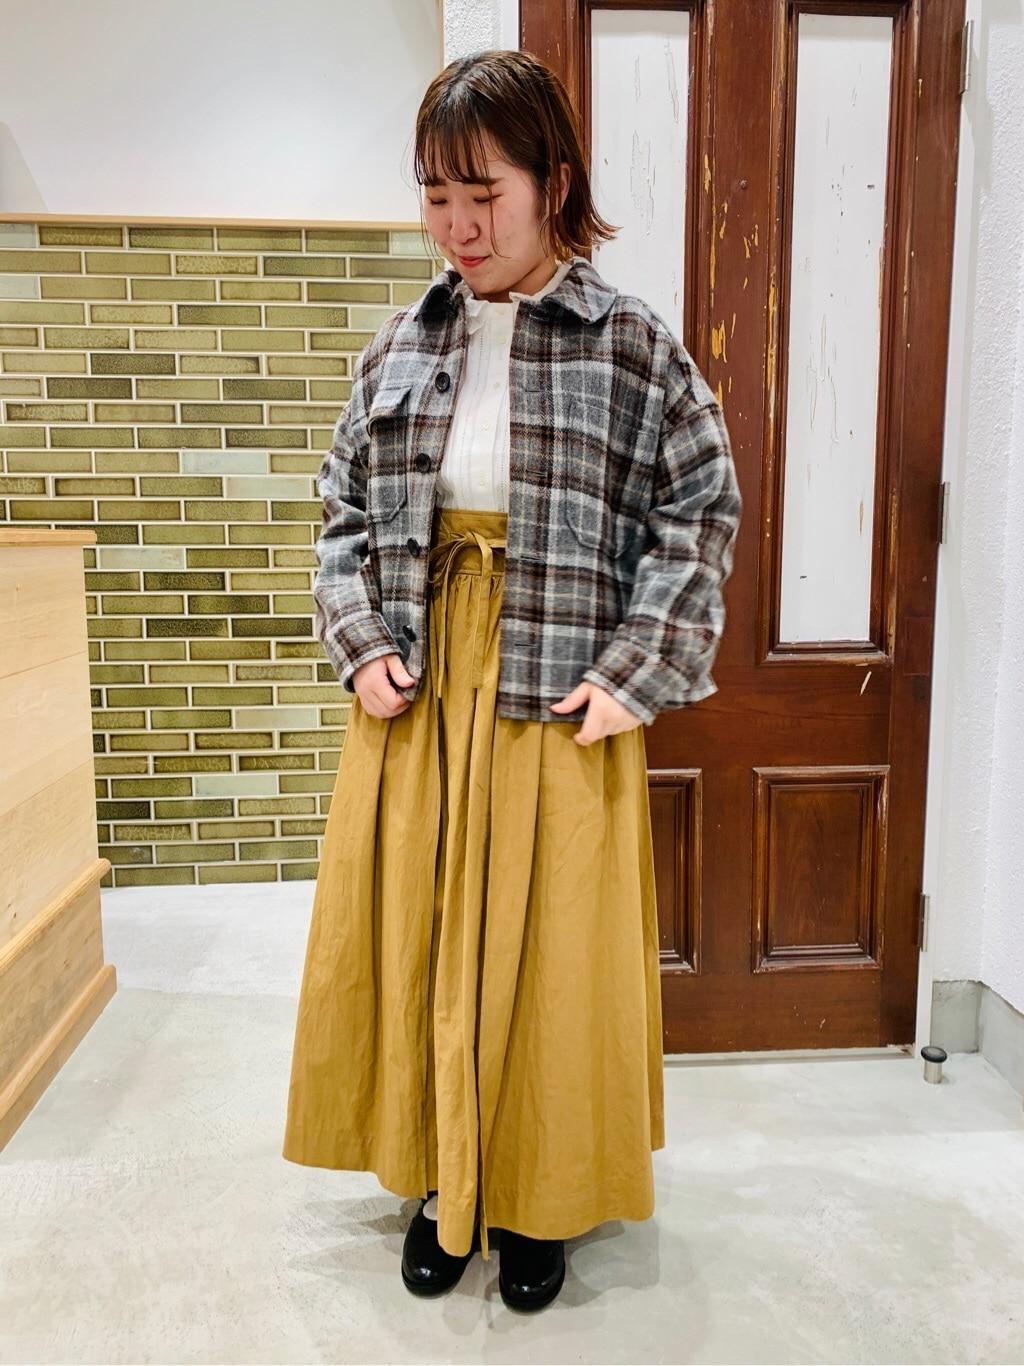 chambre de charme 横浜ジョイナス 身長:155cm 2020.10.20